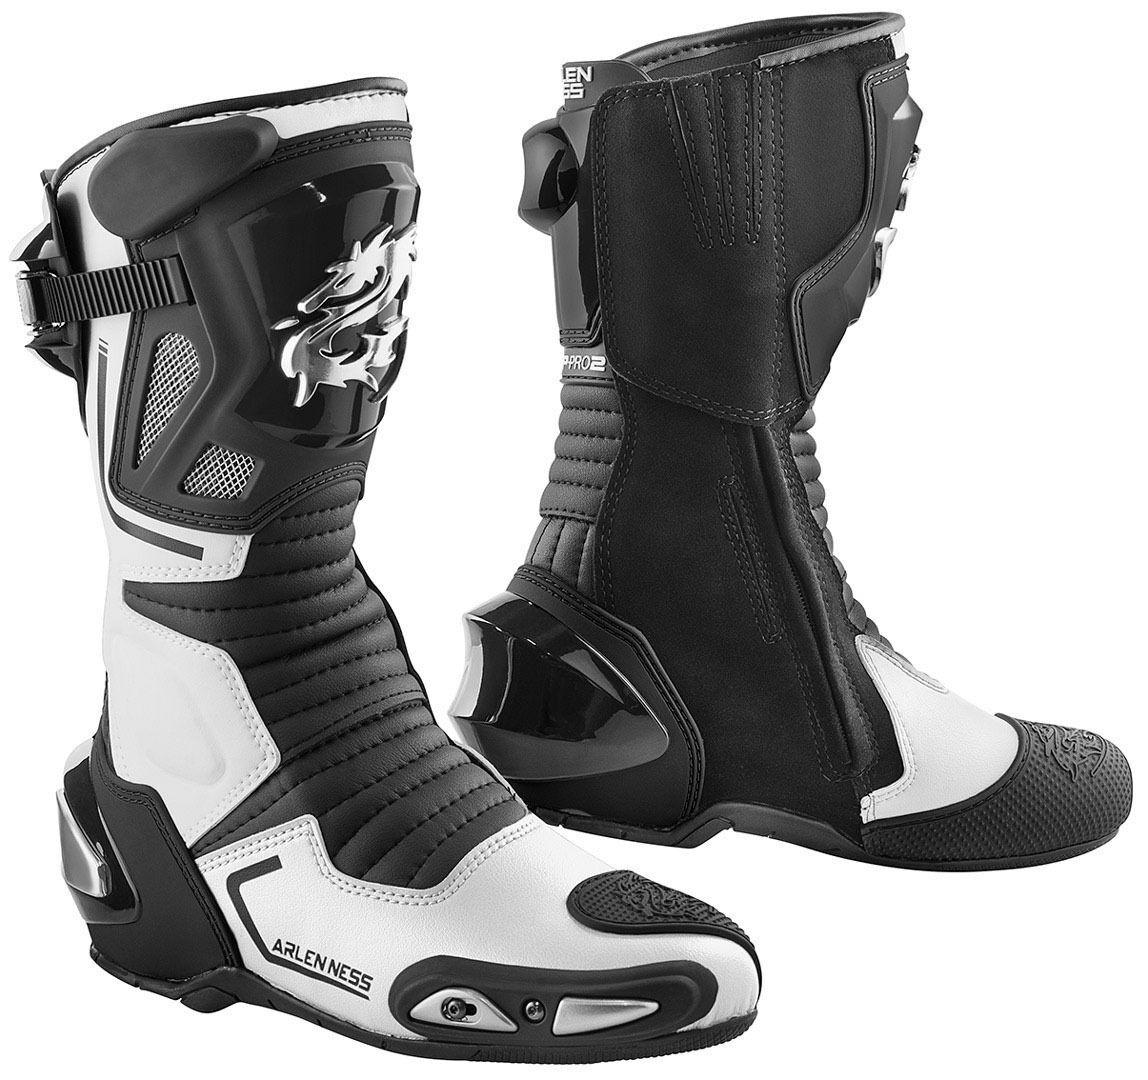 Arlen Ness Sugello Bottes de moto Noir Blanc taille : 48